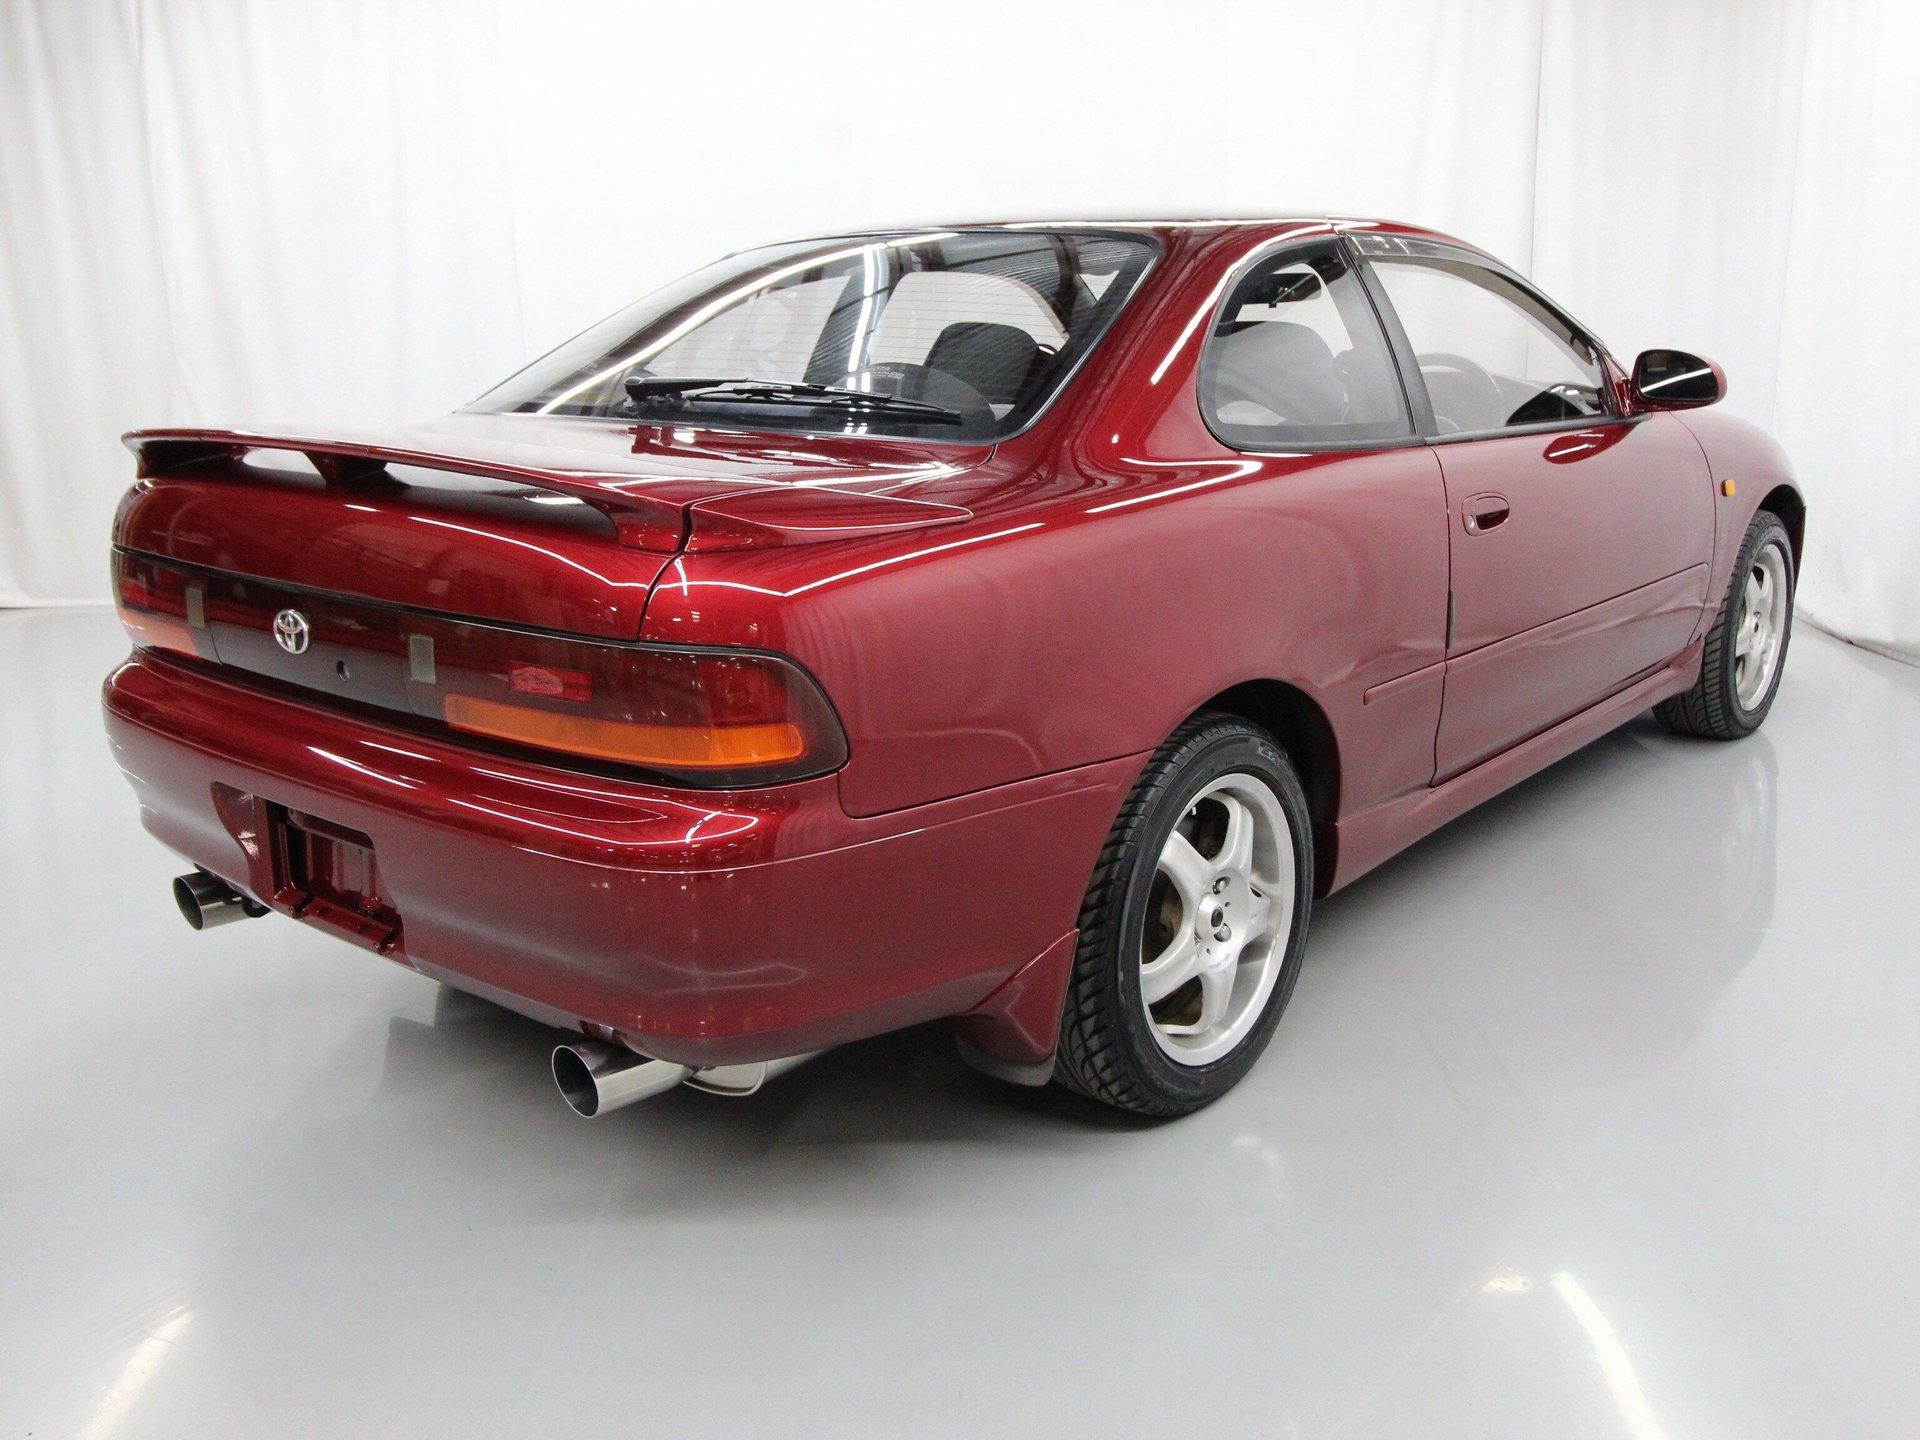 1993 Toyota Corolla Levin